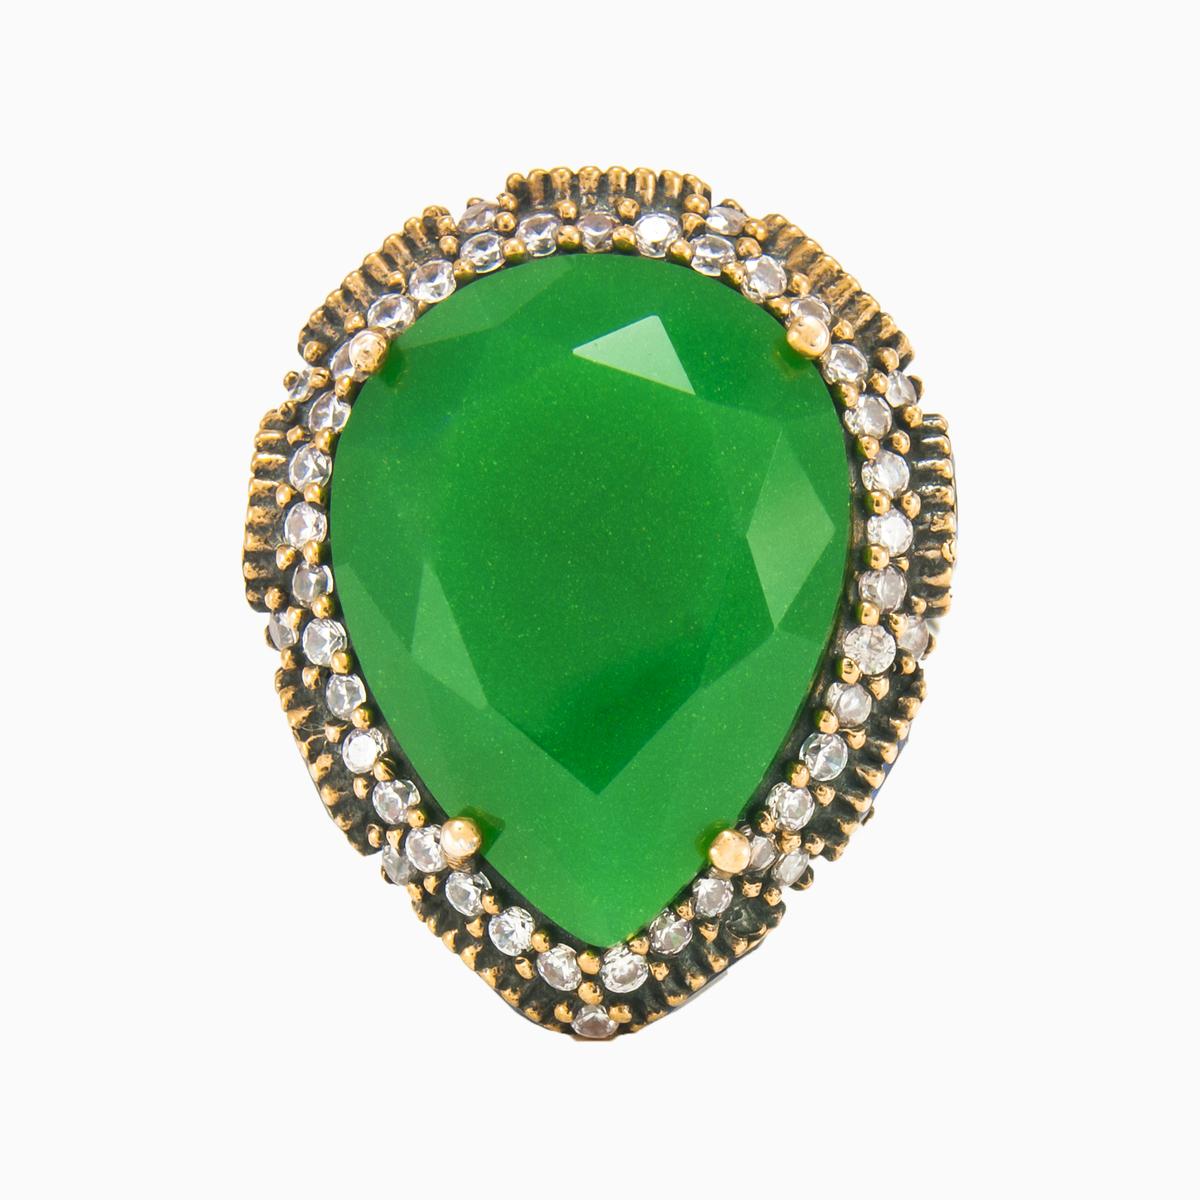 jadeite jewelry value - photo #45